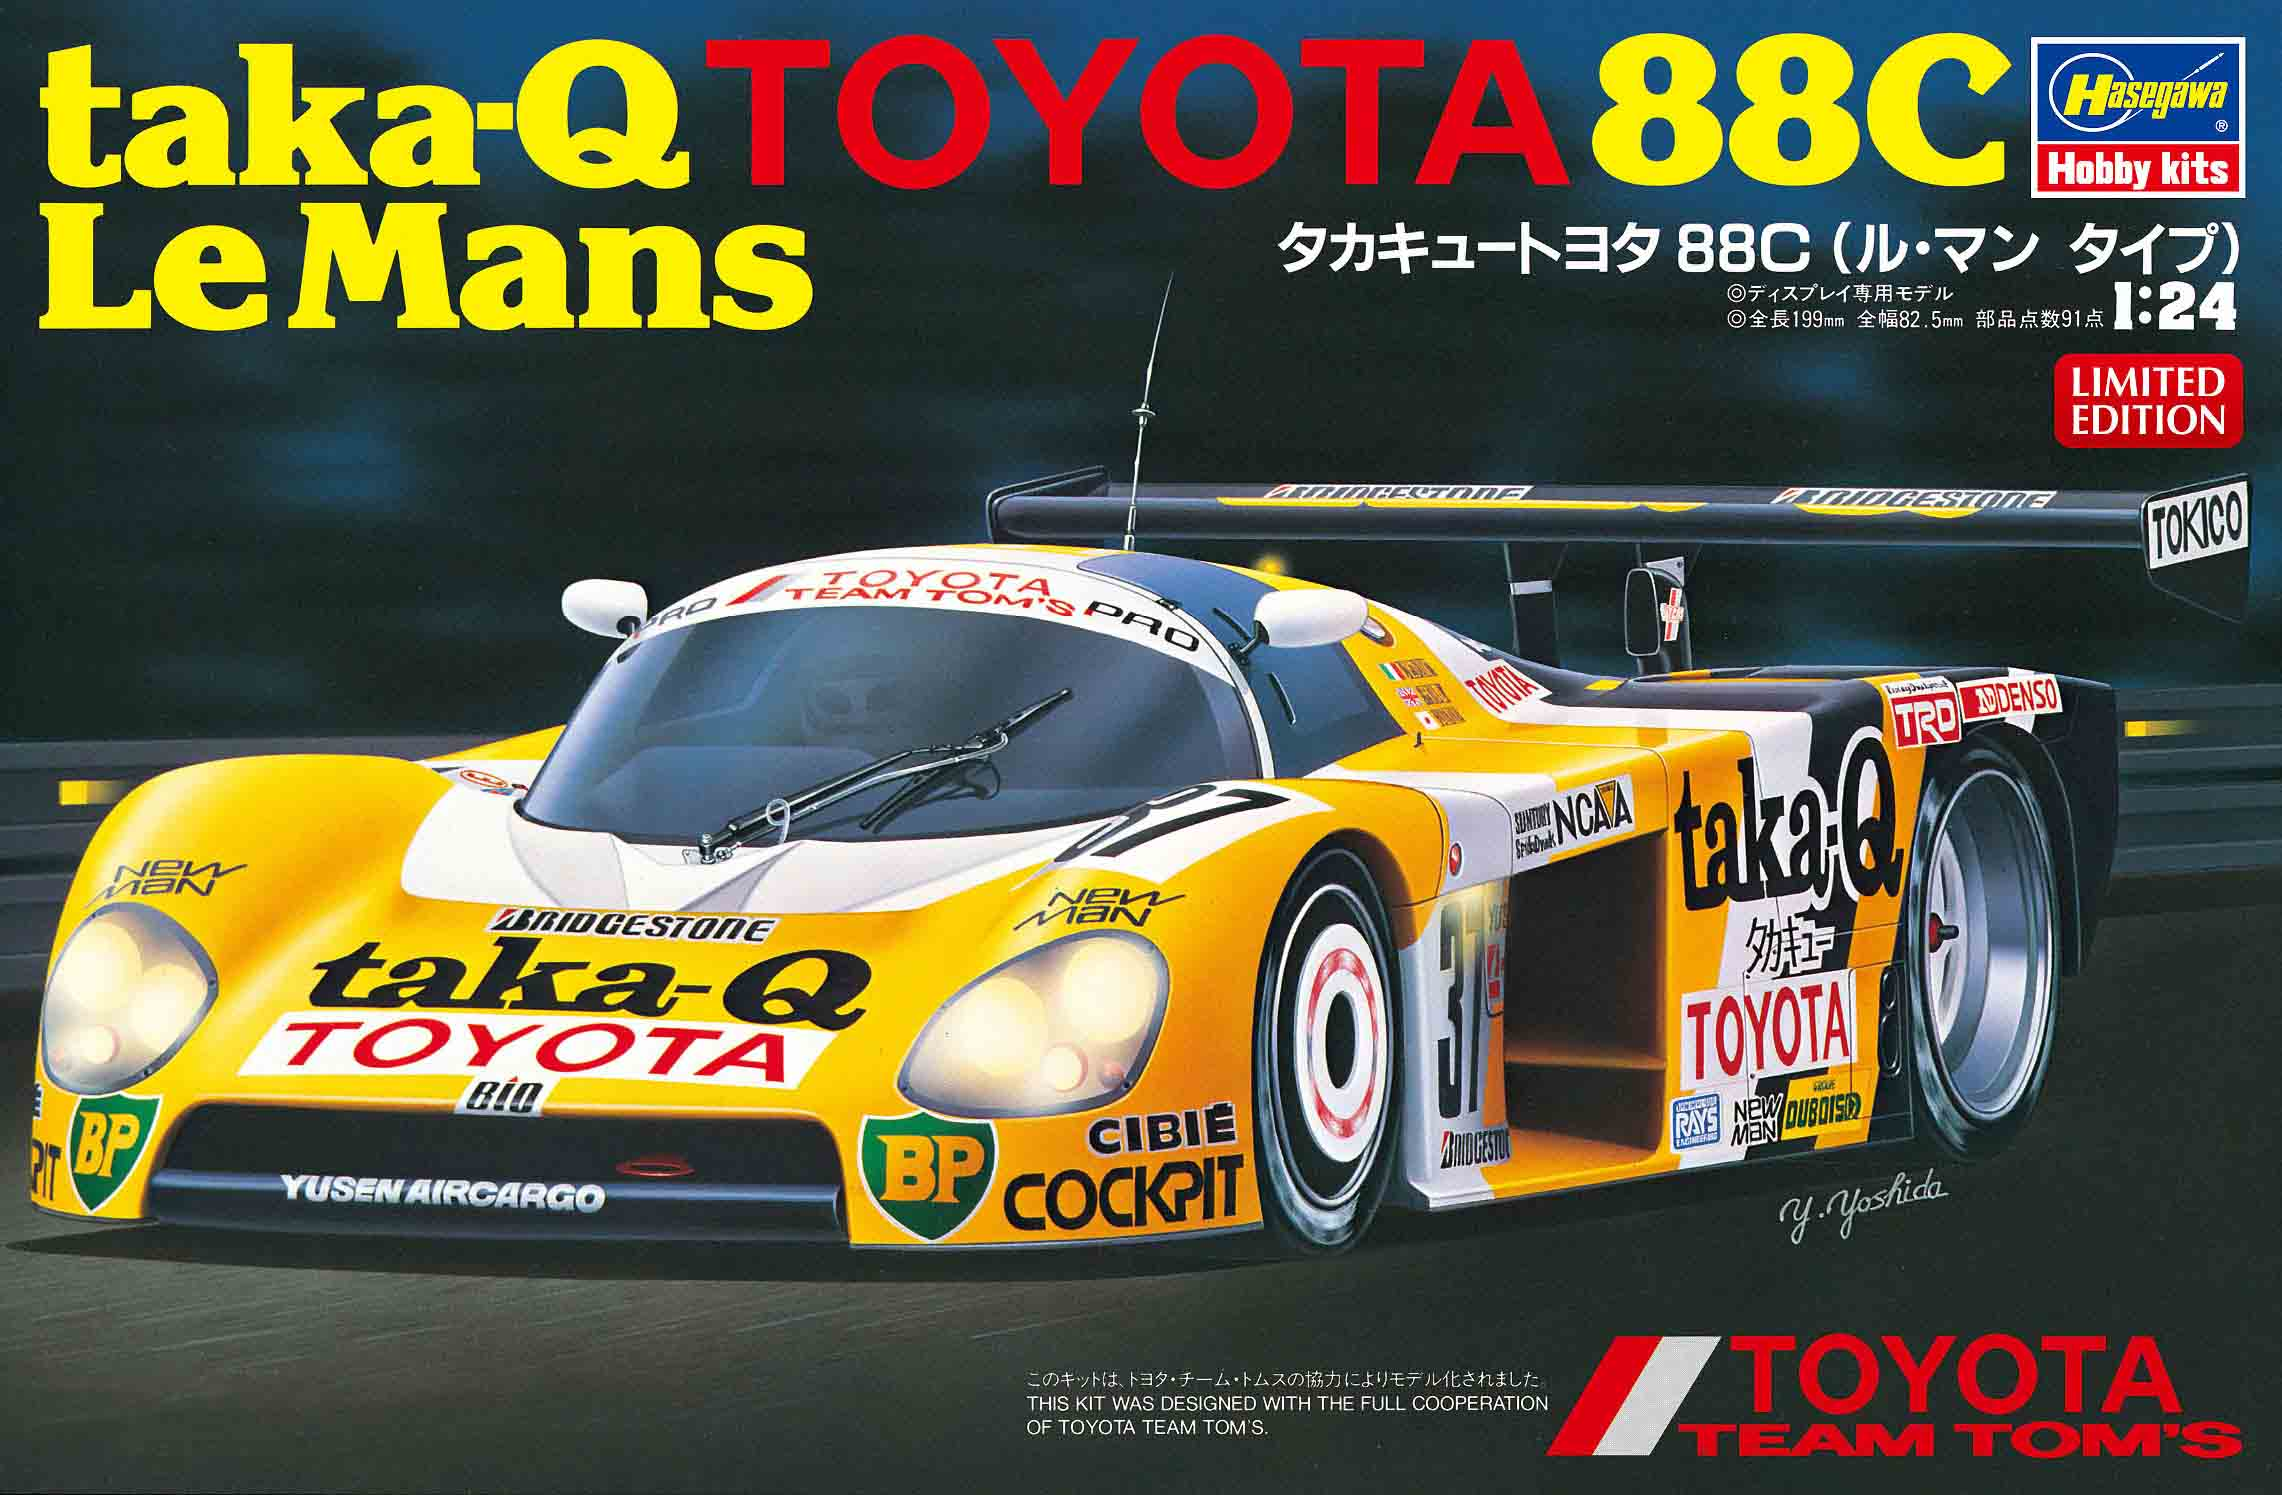 Hasegawa 1/24 taka-Q TOYOTA 88C Le Mans